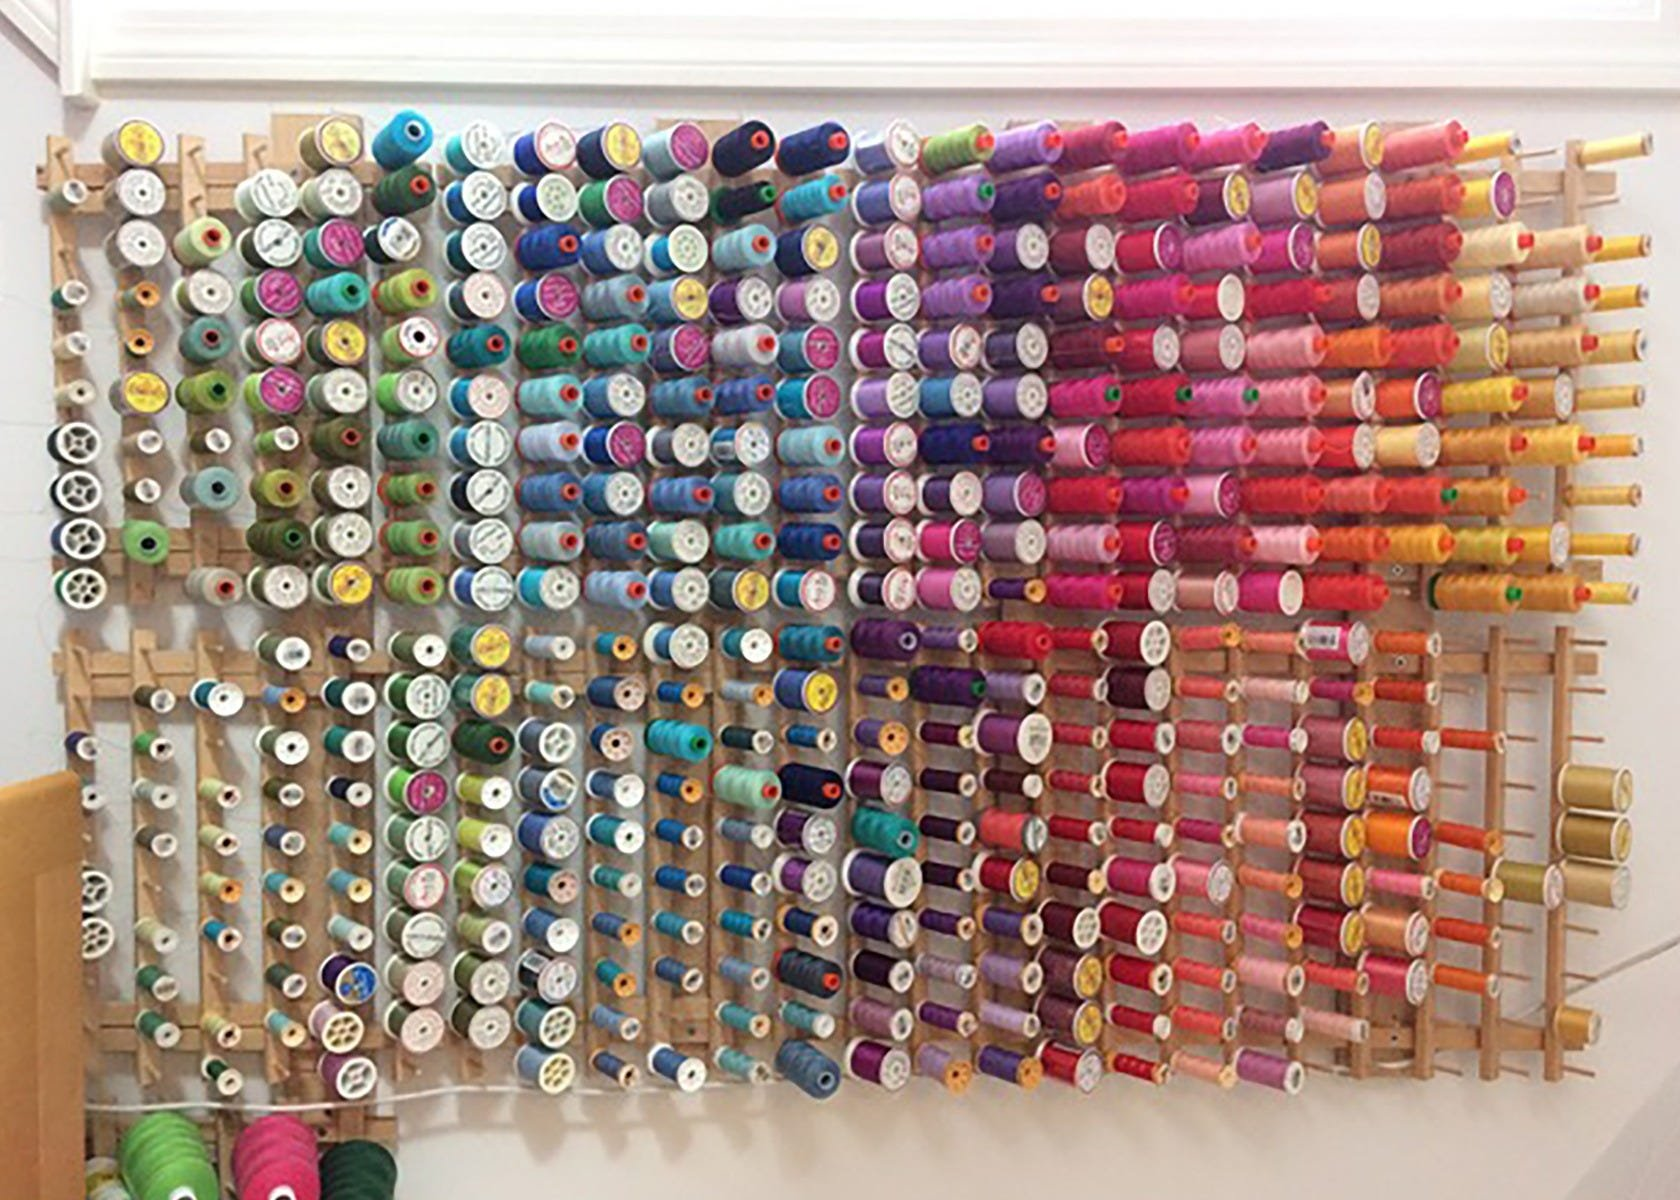 Thread organization and storage